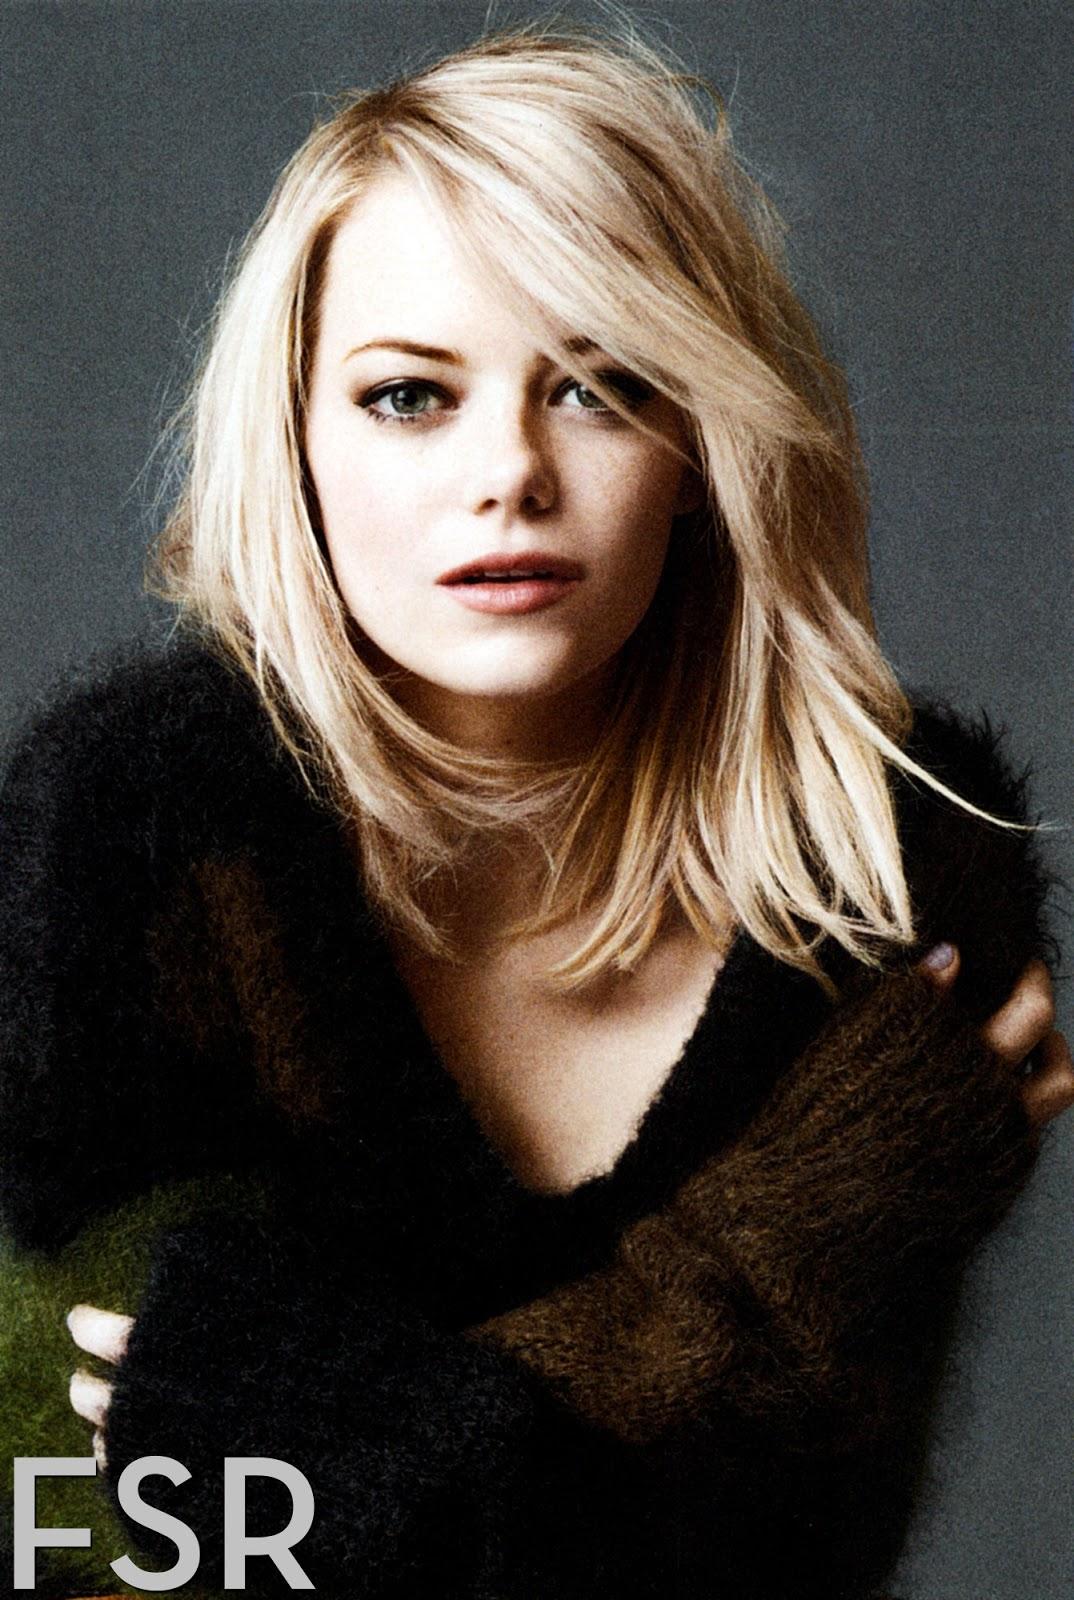 Emma Stone: Hot Emma Stone Photoshoot Emma Stone Zombieland Hair